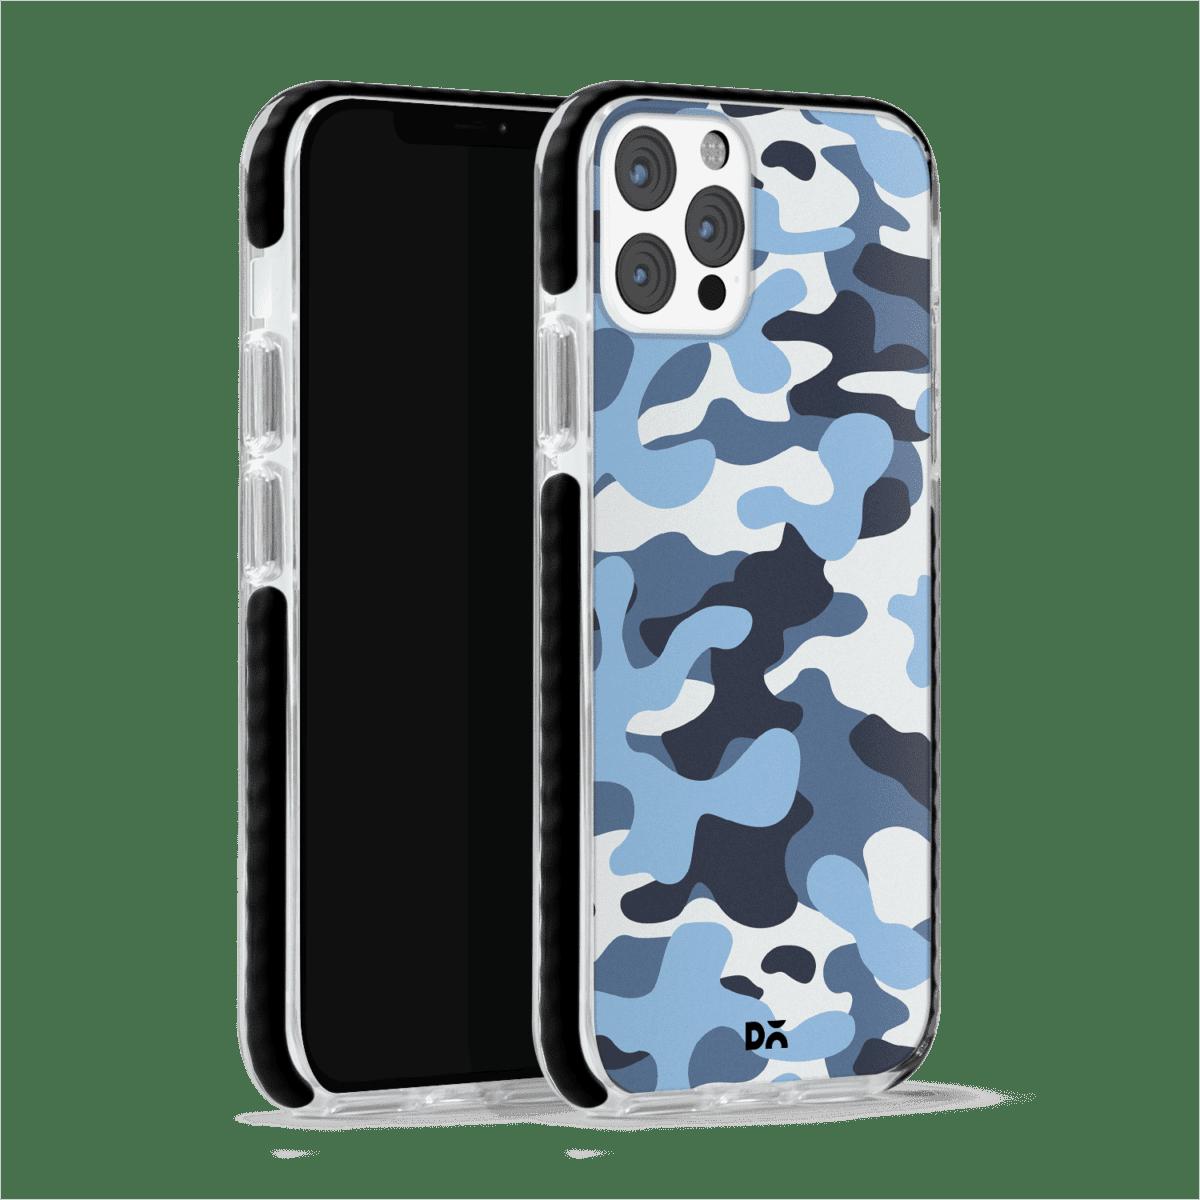 Klippik.com Camouflage Aquatic Stride Case Cover For iPhone 12 Pro view 3 | KlippiK.com | Online Shopping | Kuwait UAE Saudi